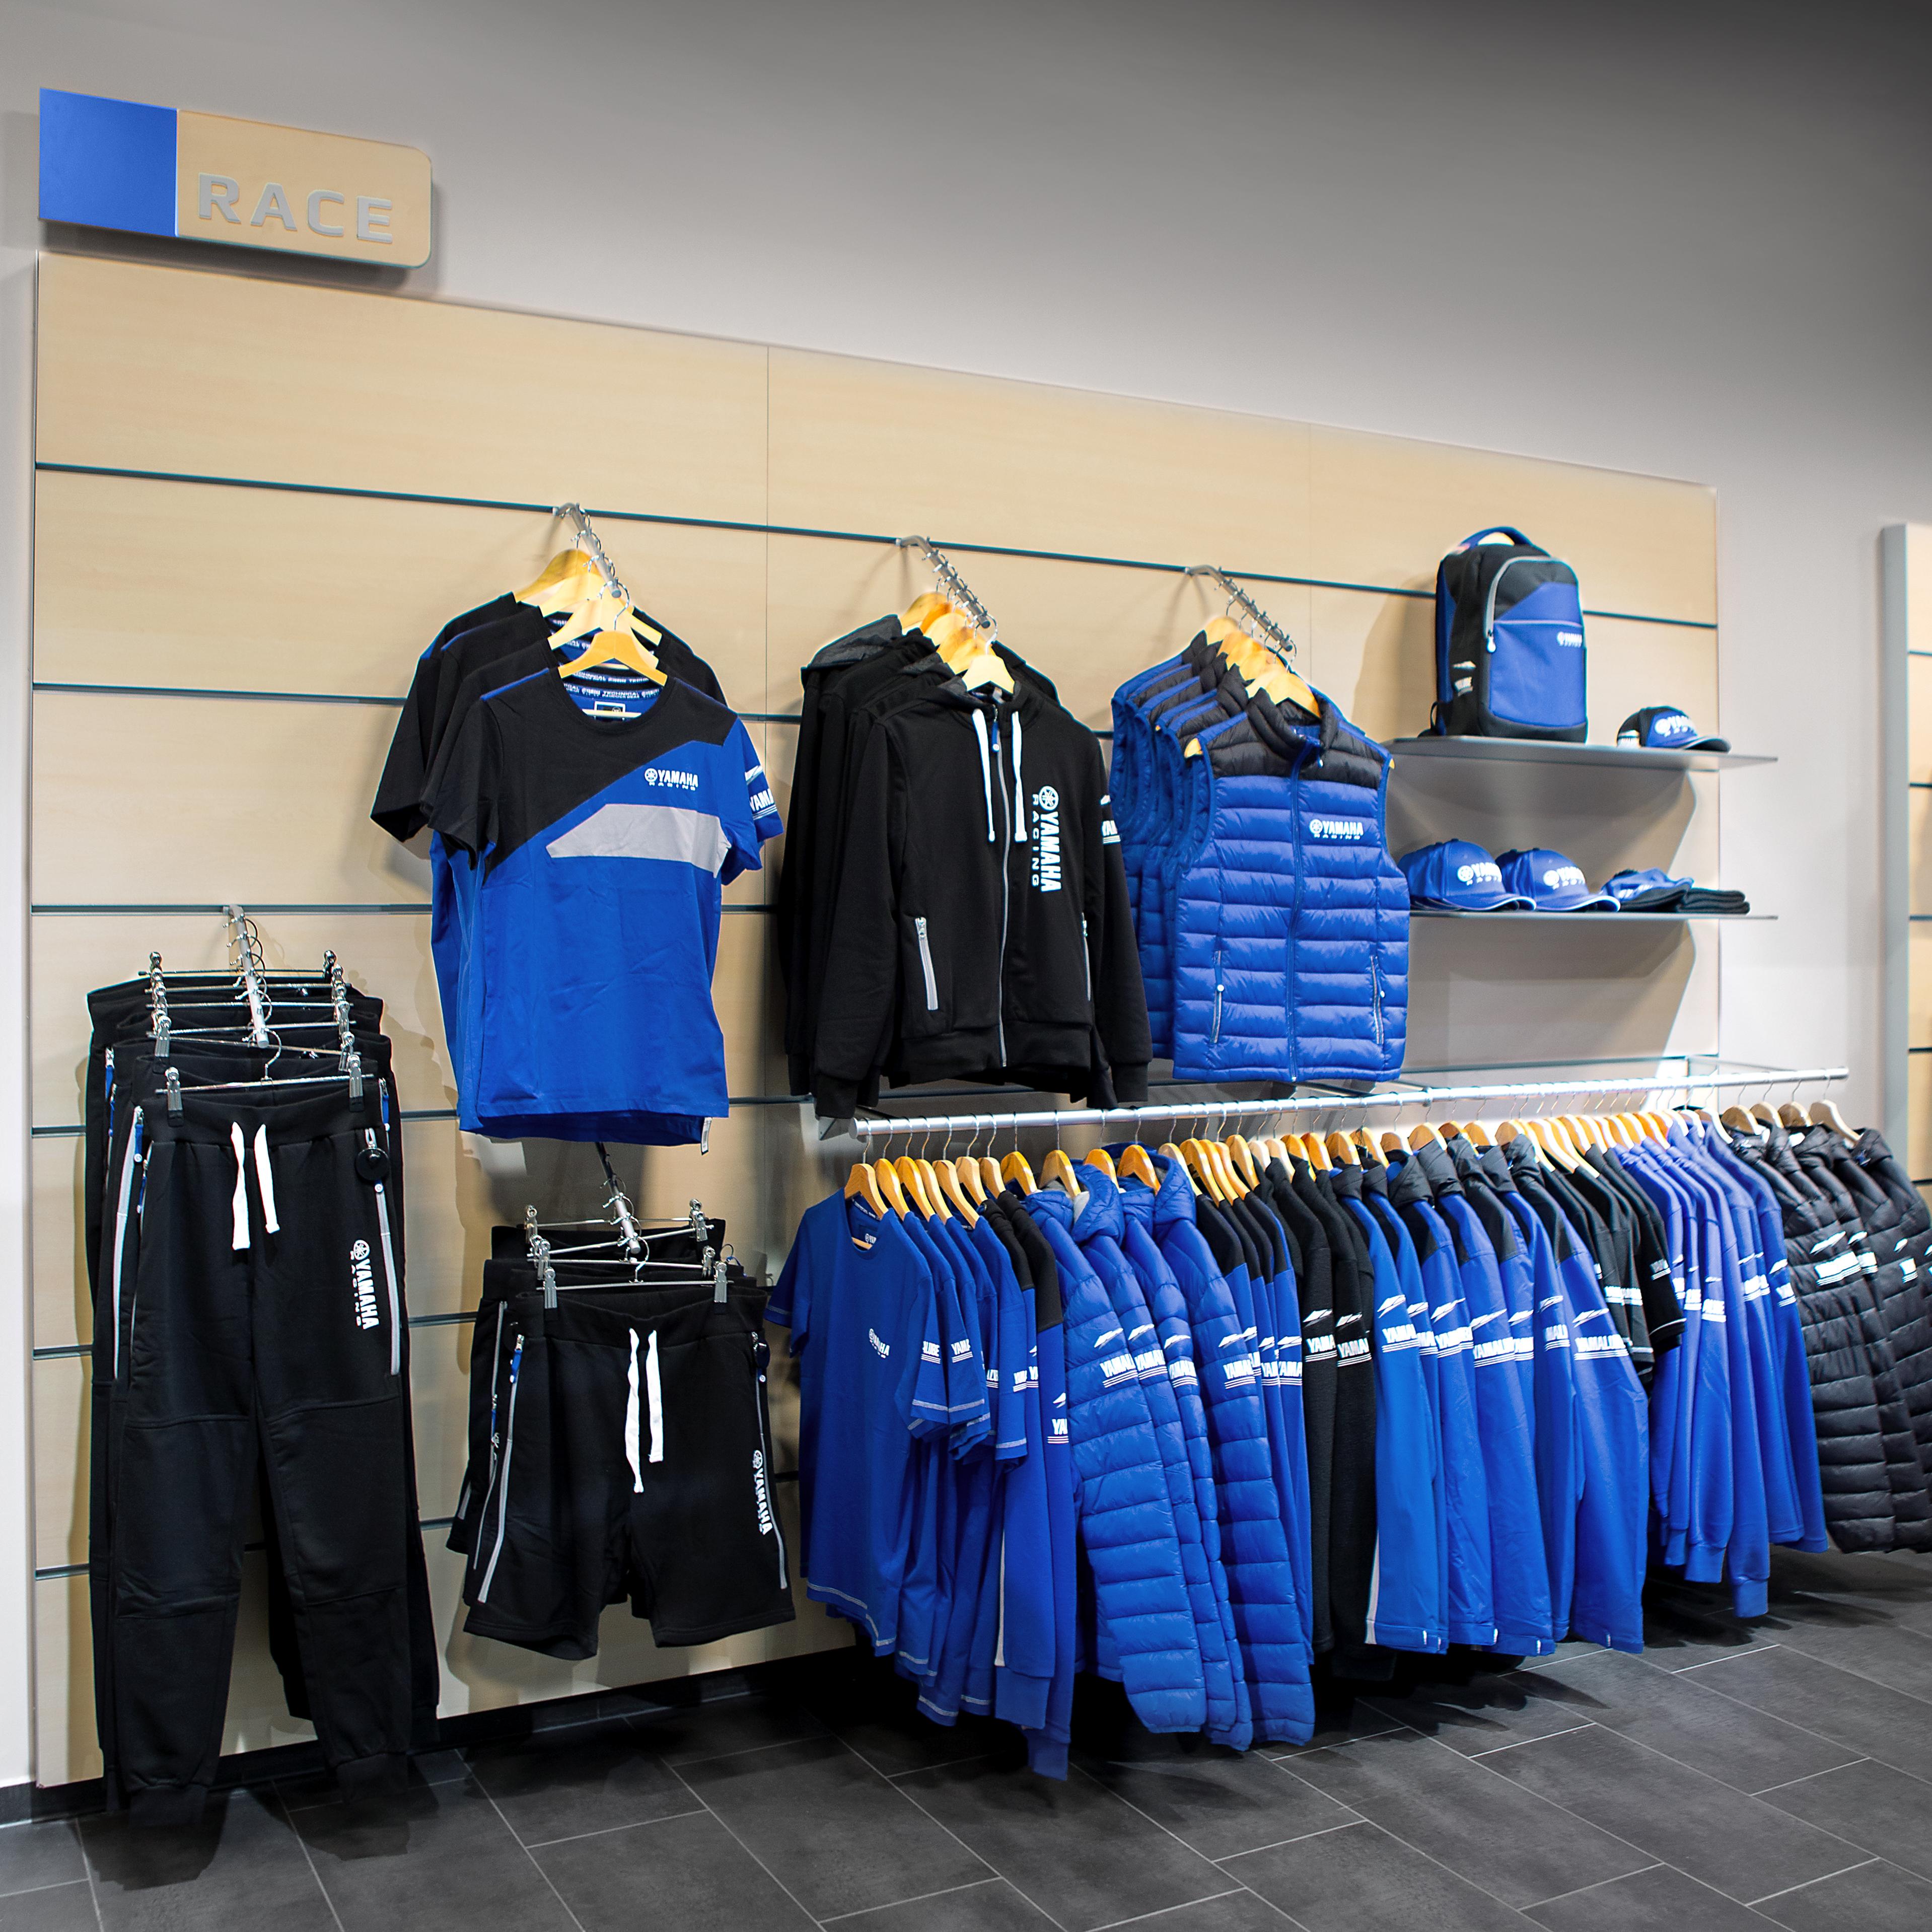 Retail Hostettler Sursee POS Verkaufsfläche Yamaha Center